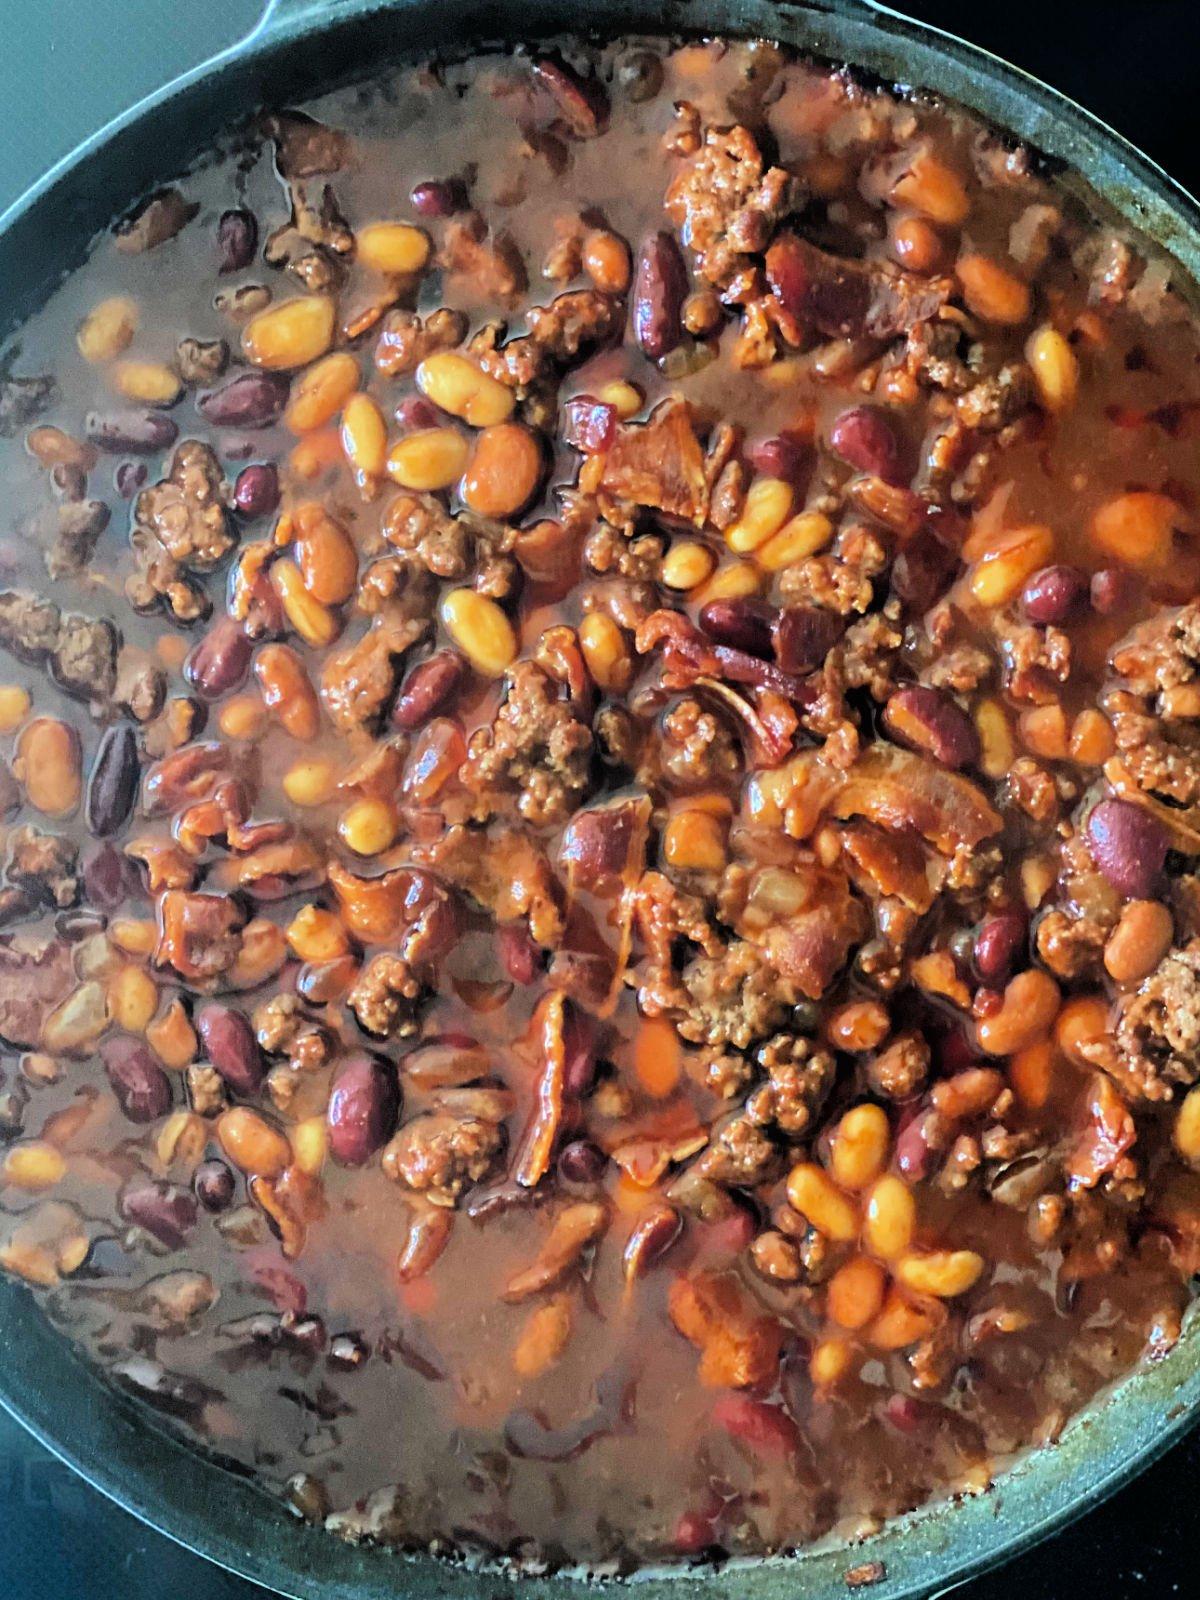 skillet of bbq baked beans